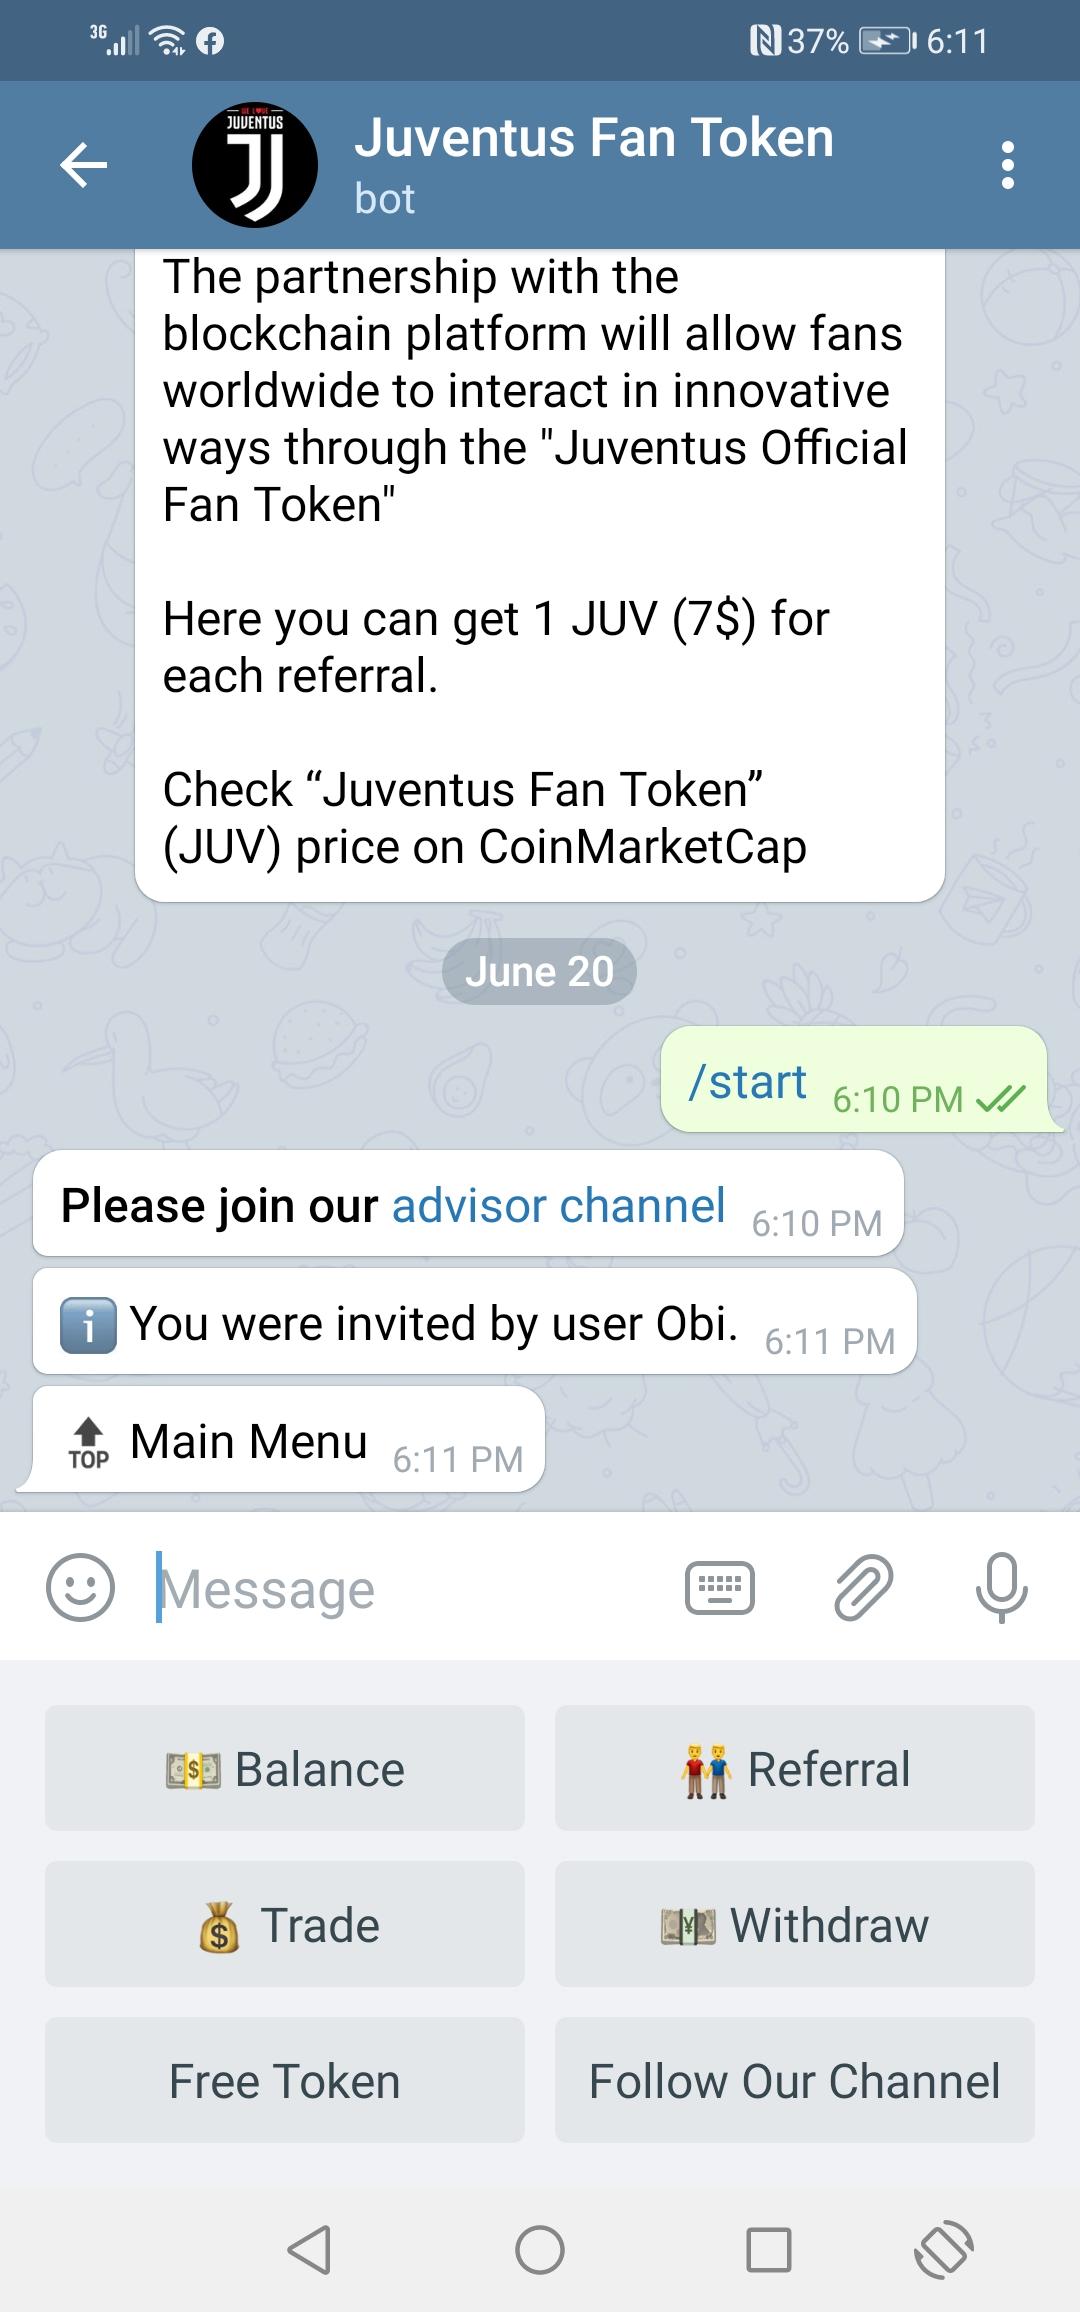 Screenshot_20200620_181110_org.telegram.messenger.jpg